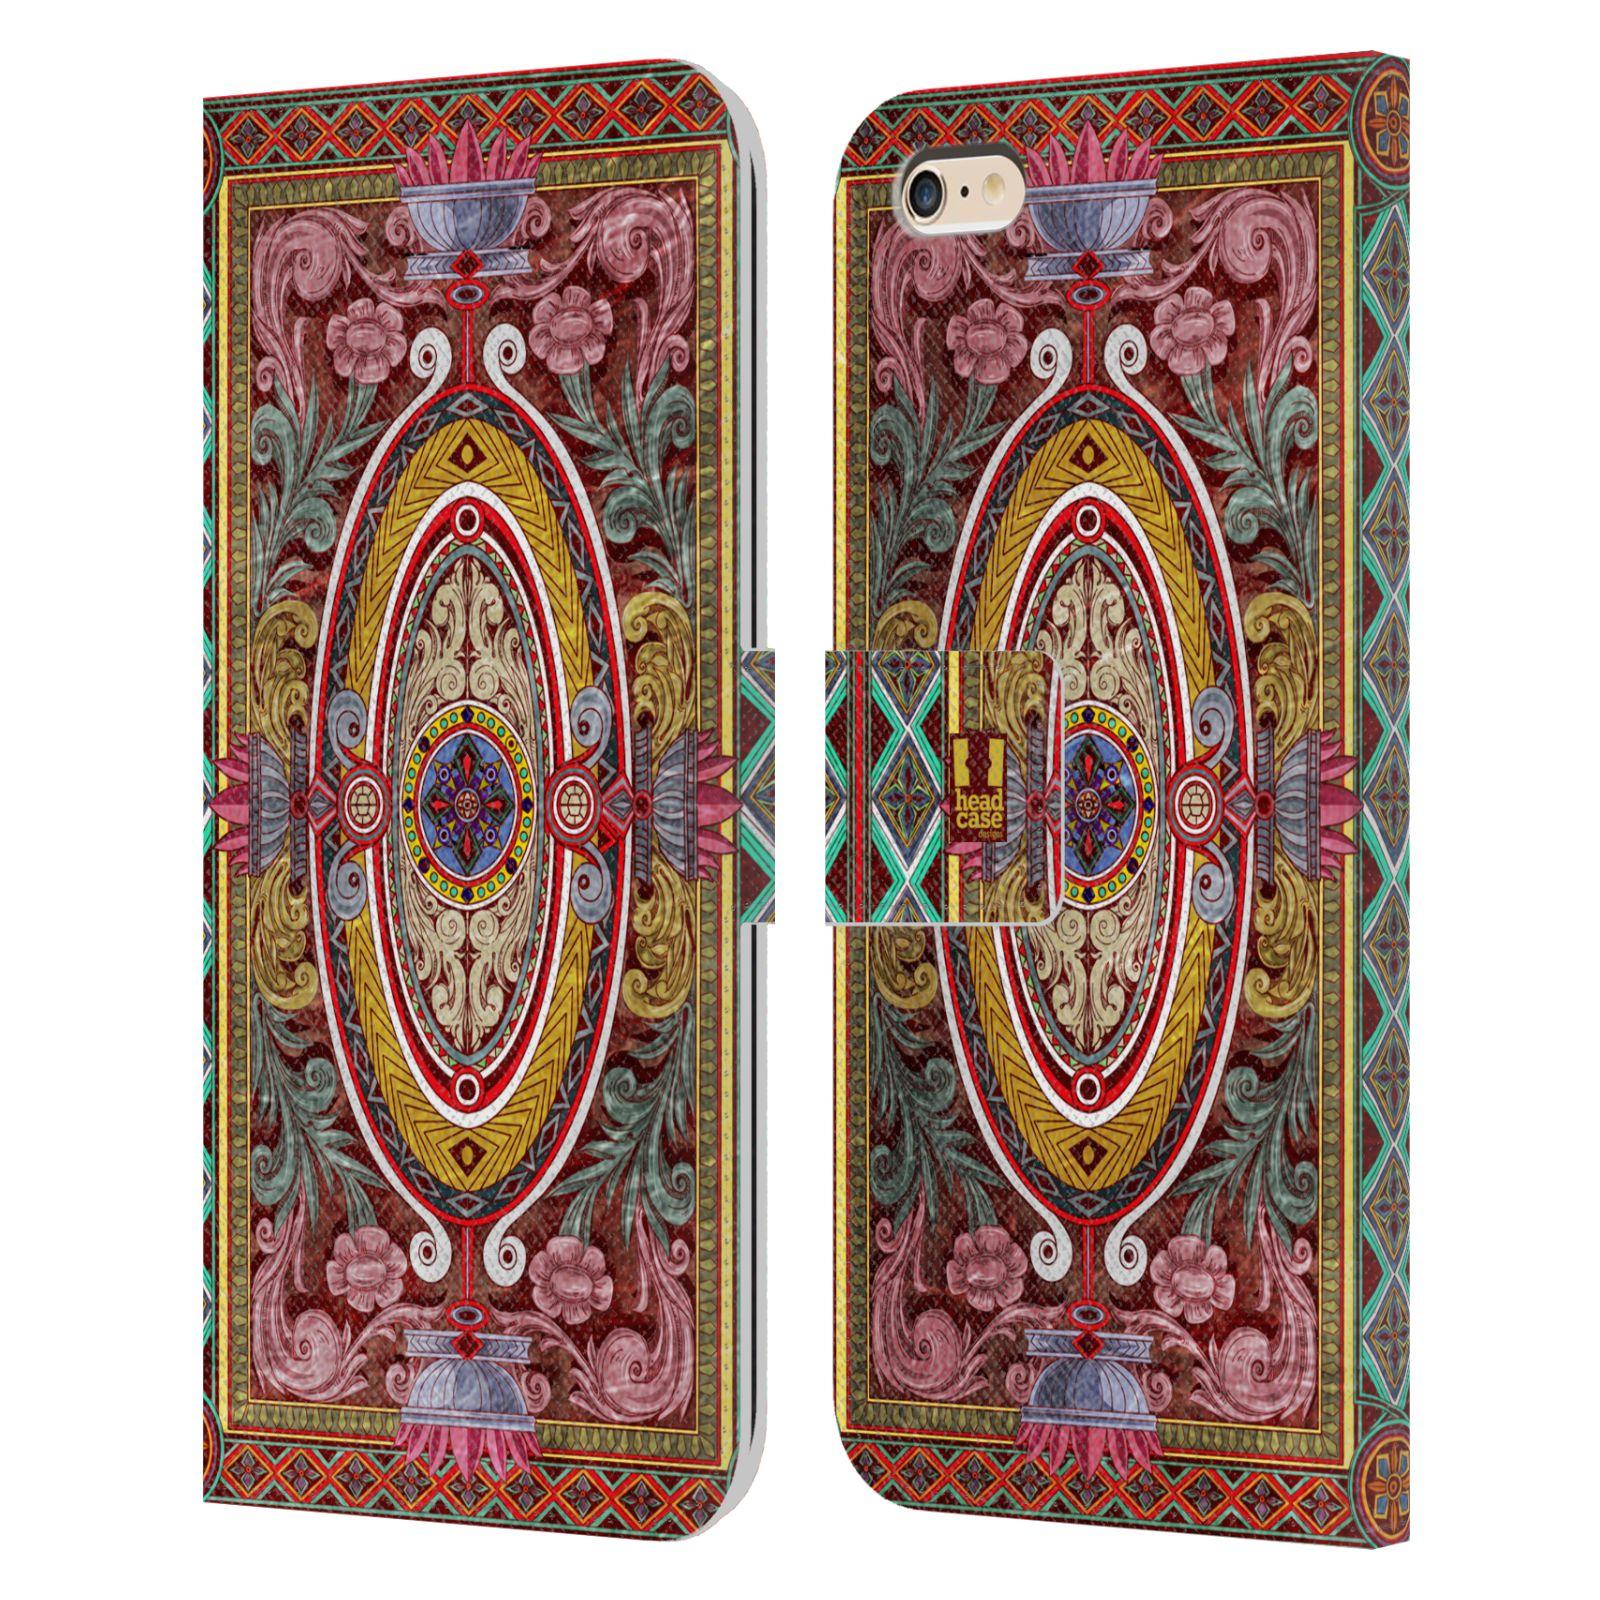 HEAD CASE Flipové pouzdro pro mobil Apple Iphone 6 PLUS / 6S PLUS ARABESKA Baroko červená